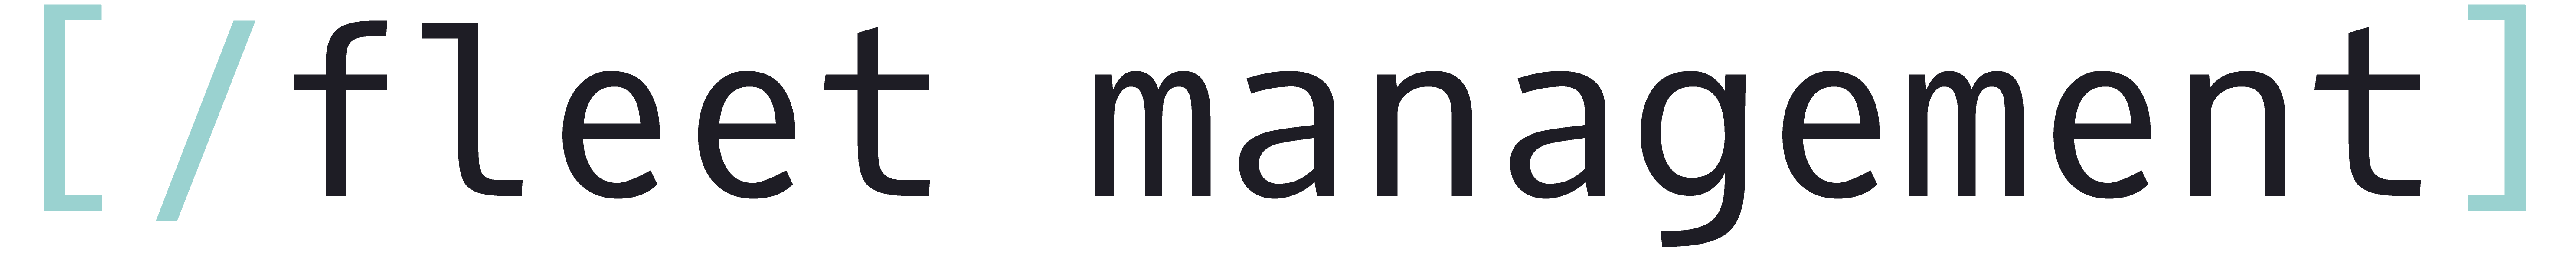 Fleet management logotipas